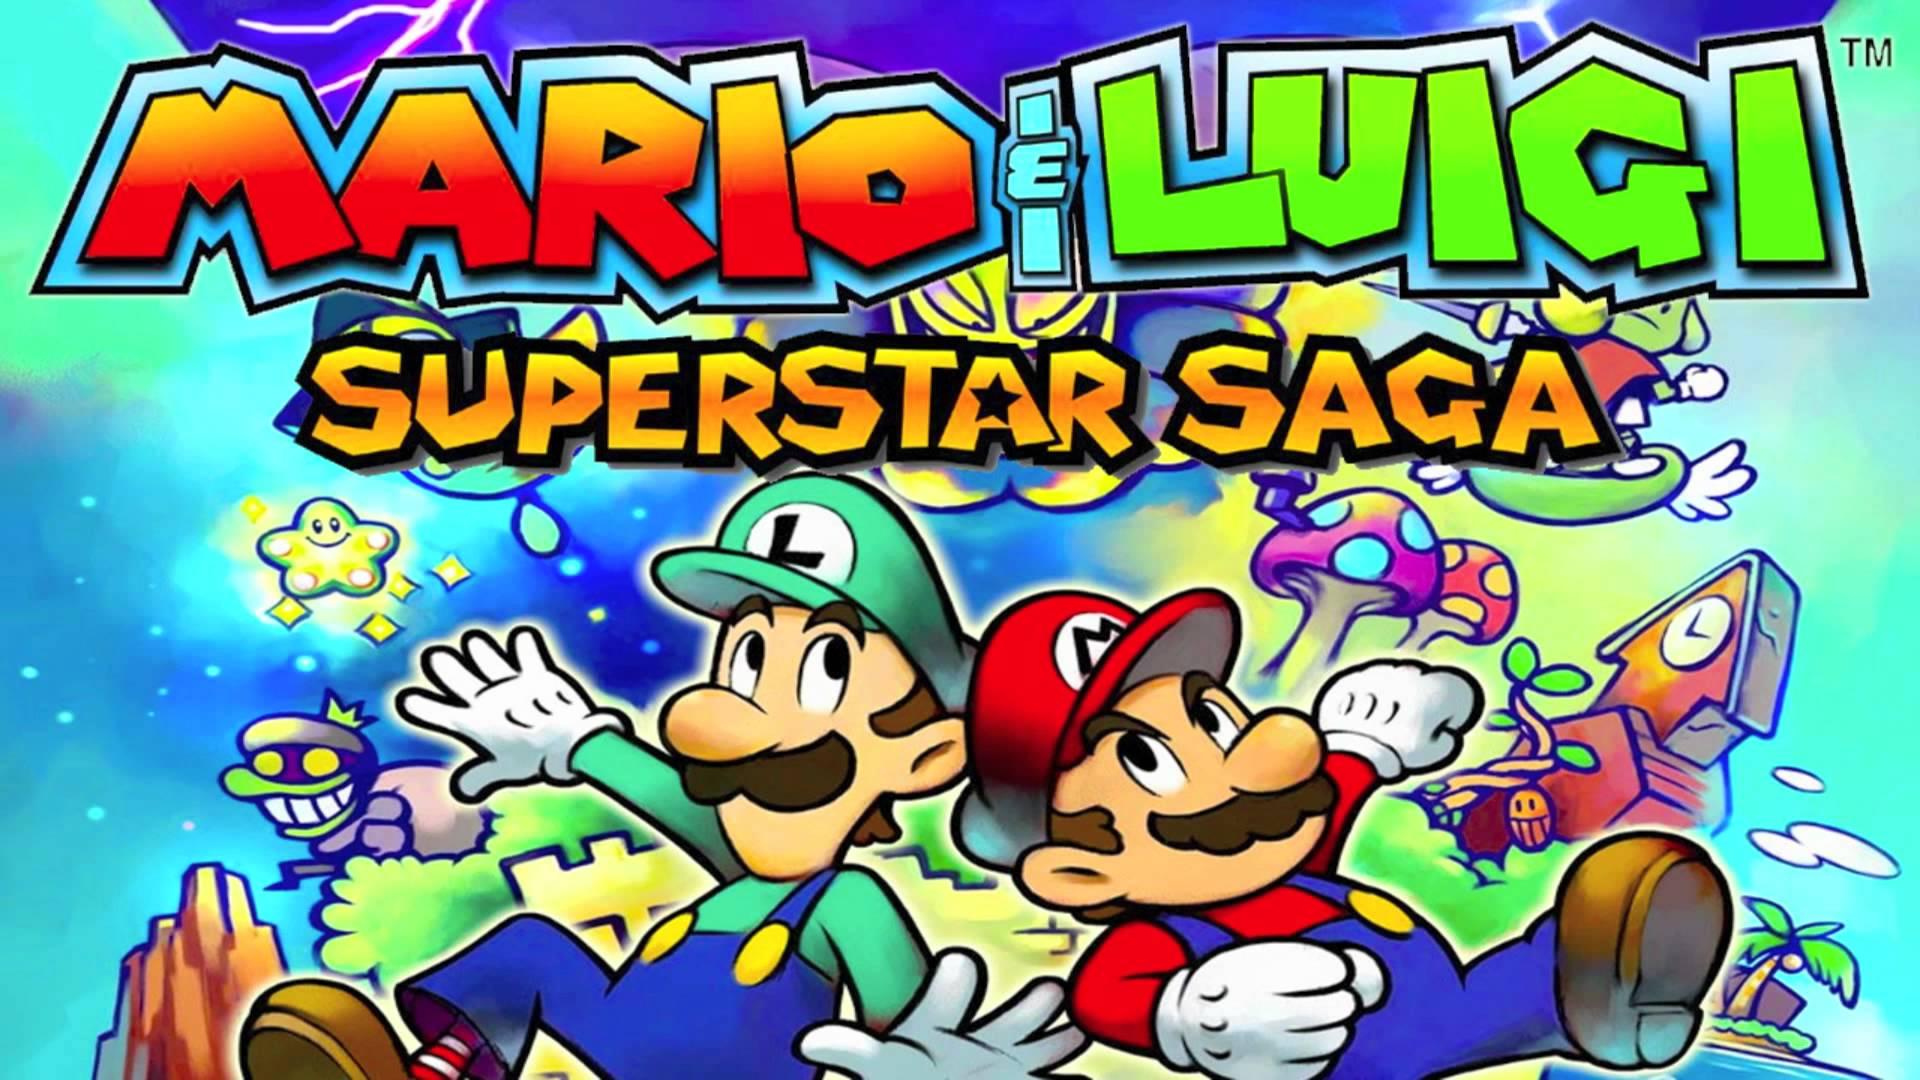 Most Viewed Mario Luigi Superstar Saga Wallpapers 4k